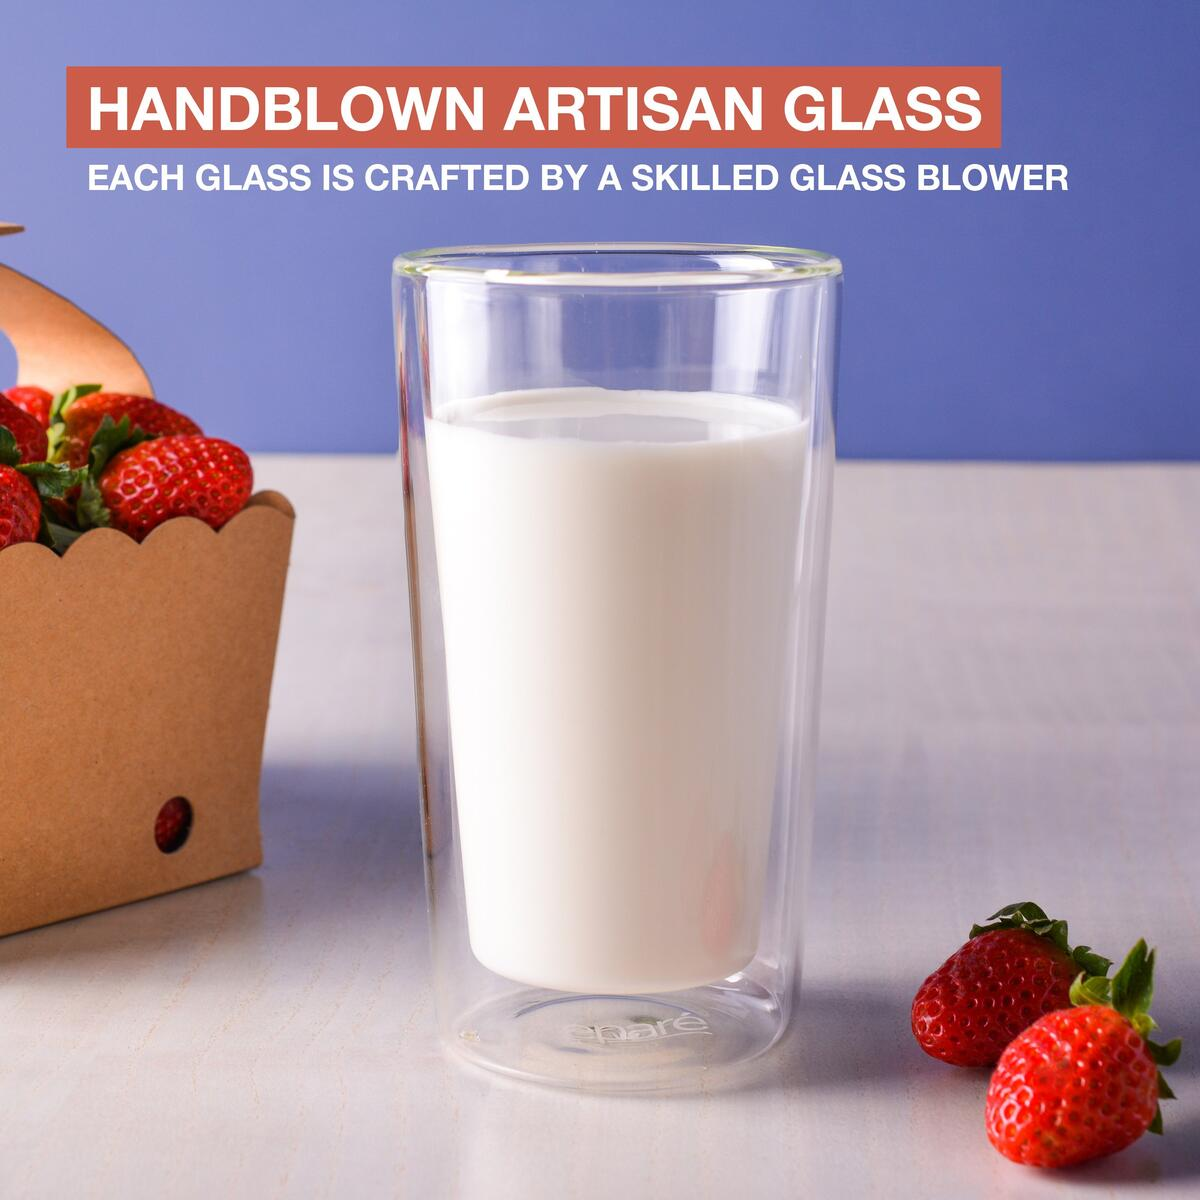 Eparé 12 oz Double Wall Highball Glass (Set of 2)